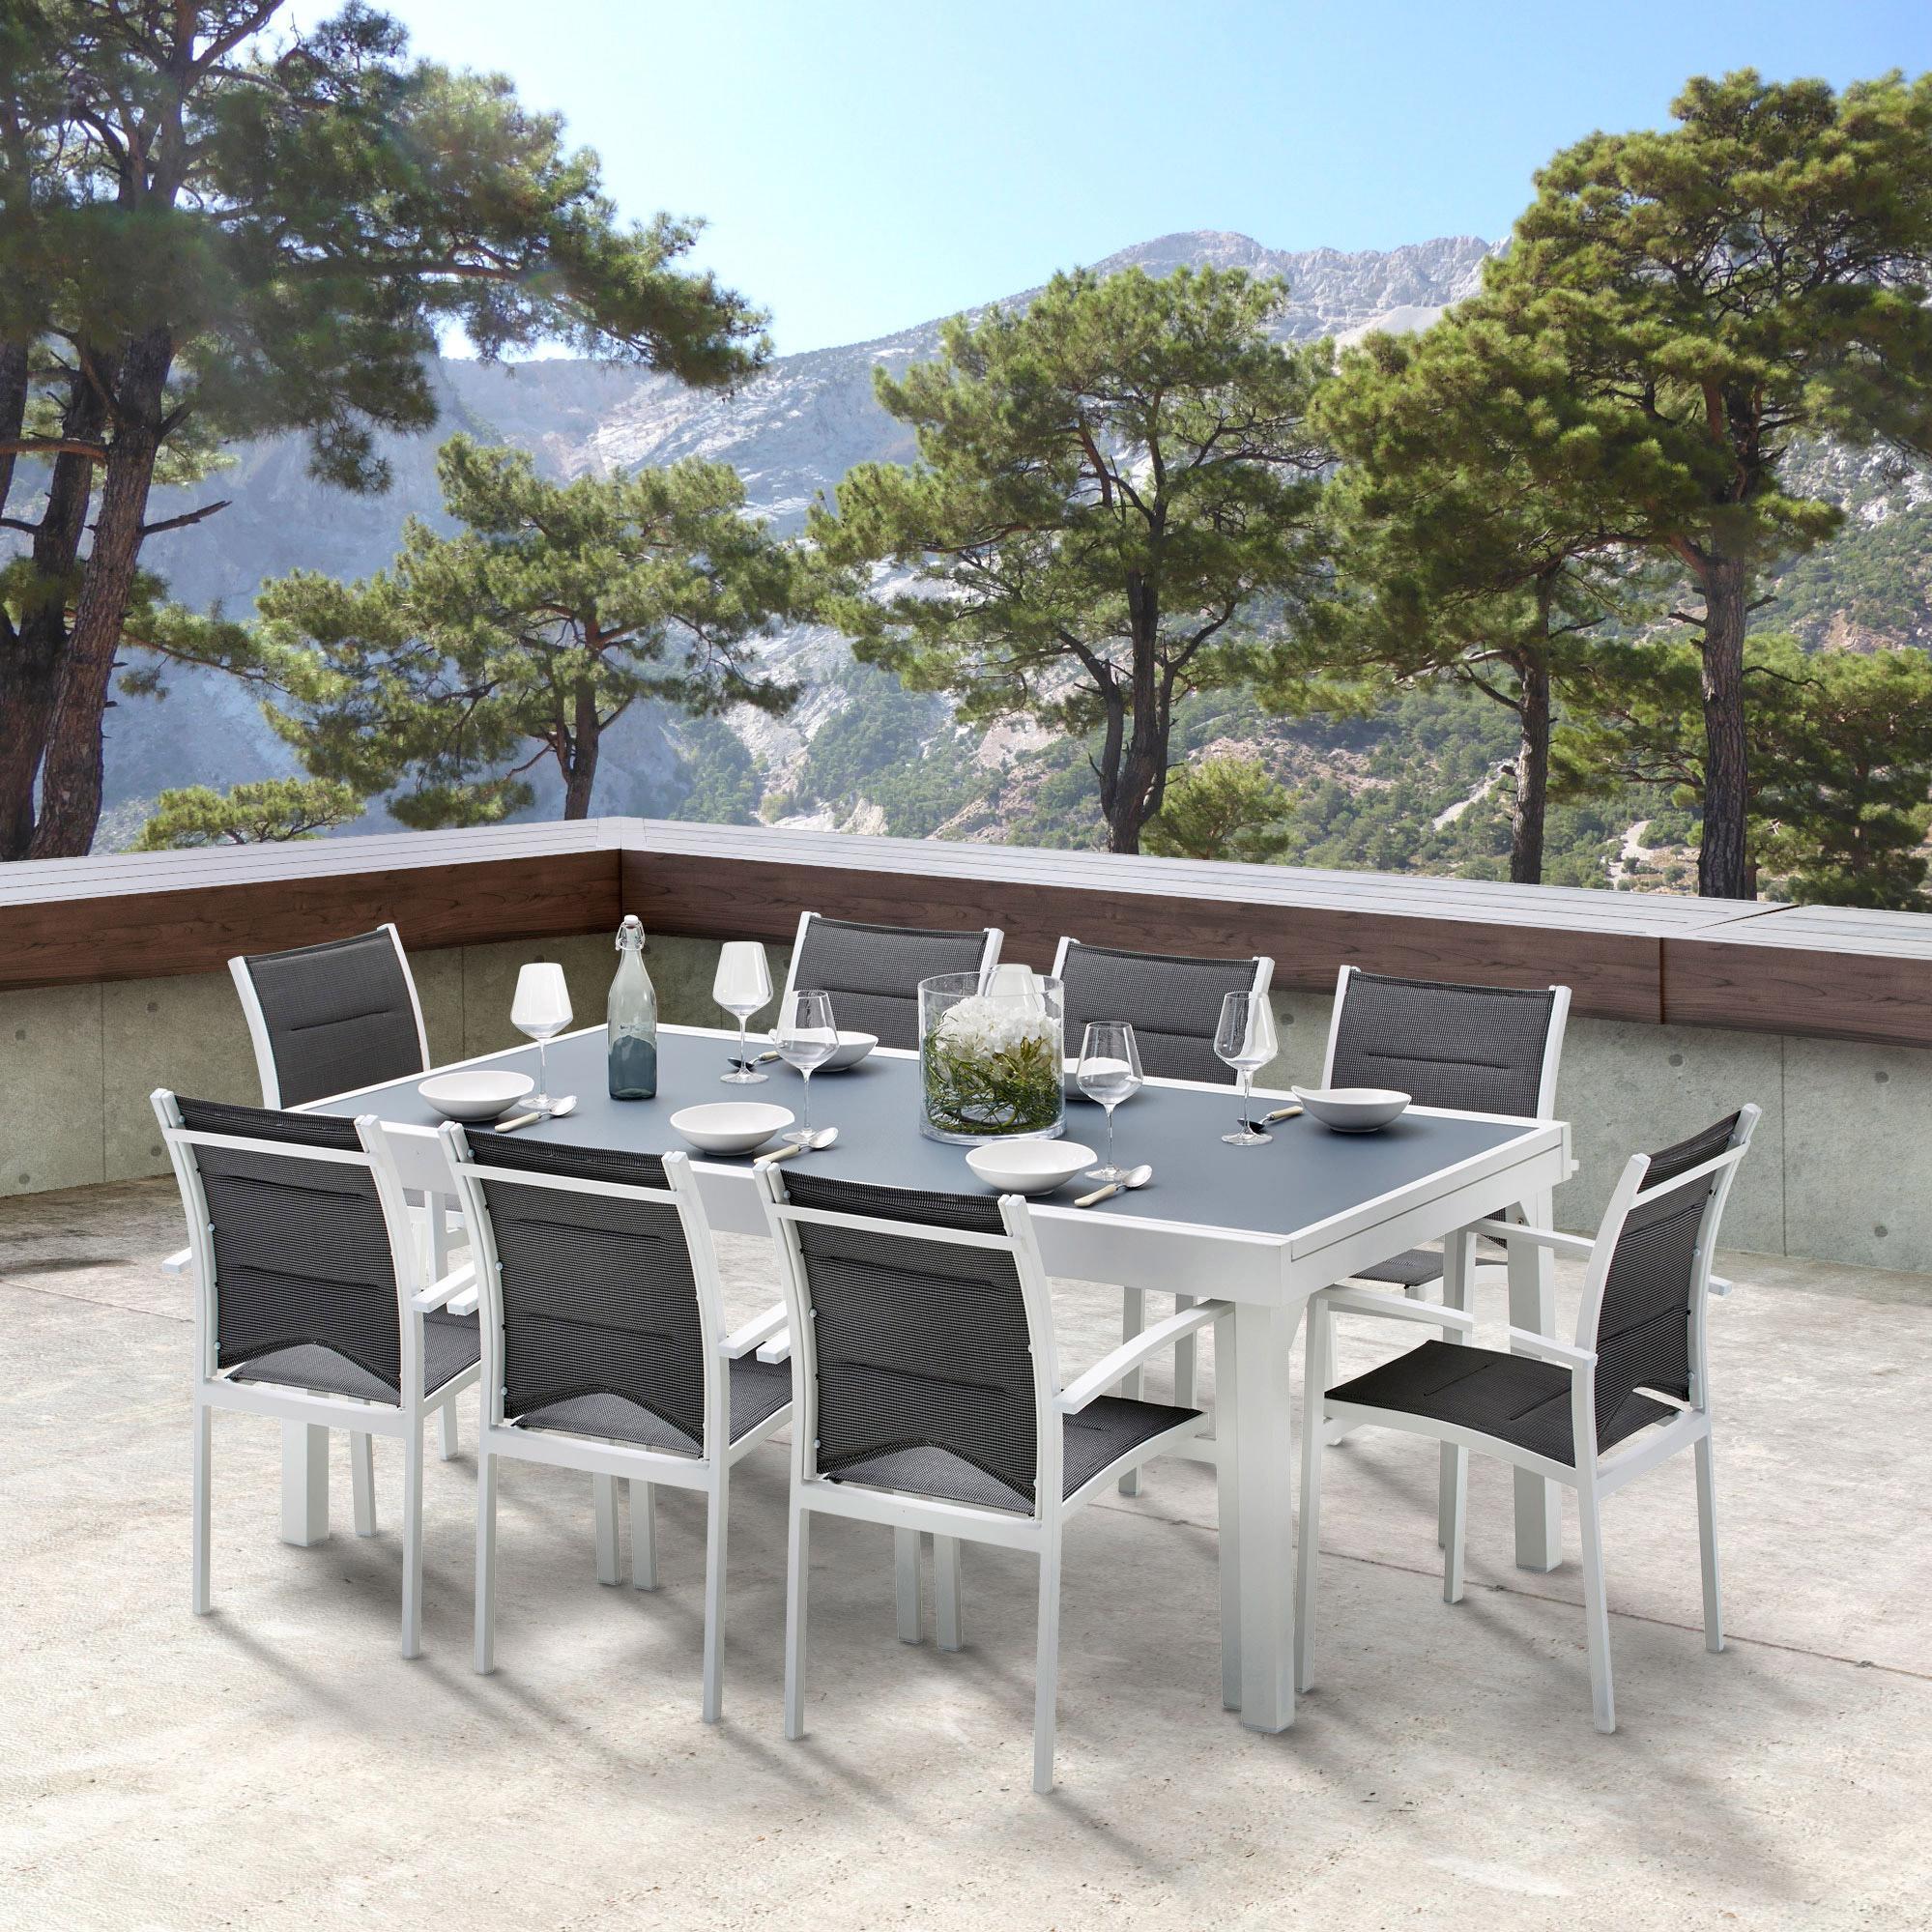 Salon de jardin Wilsa modulo t8/12 aluminium blanc, 8 personnes